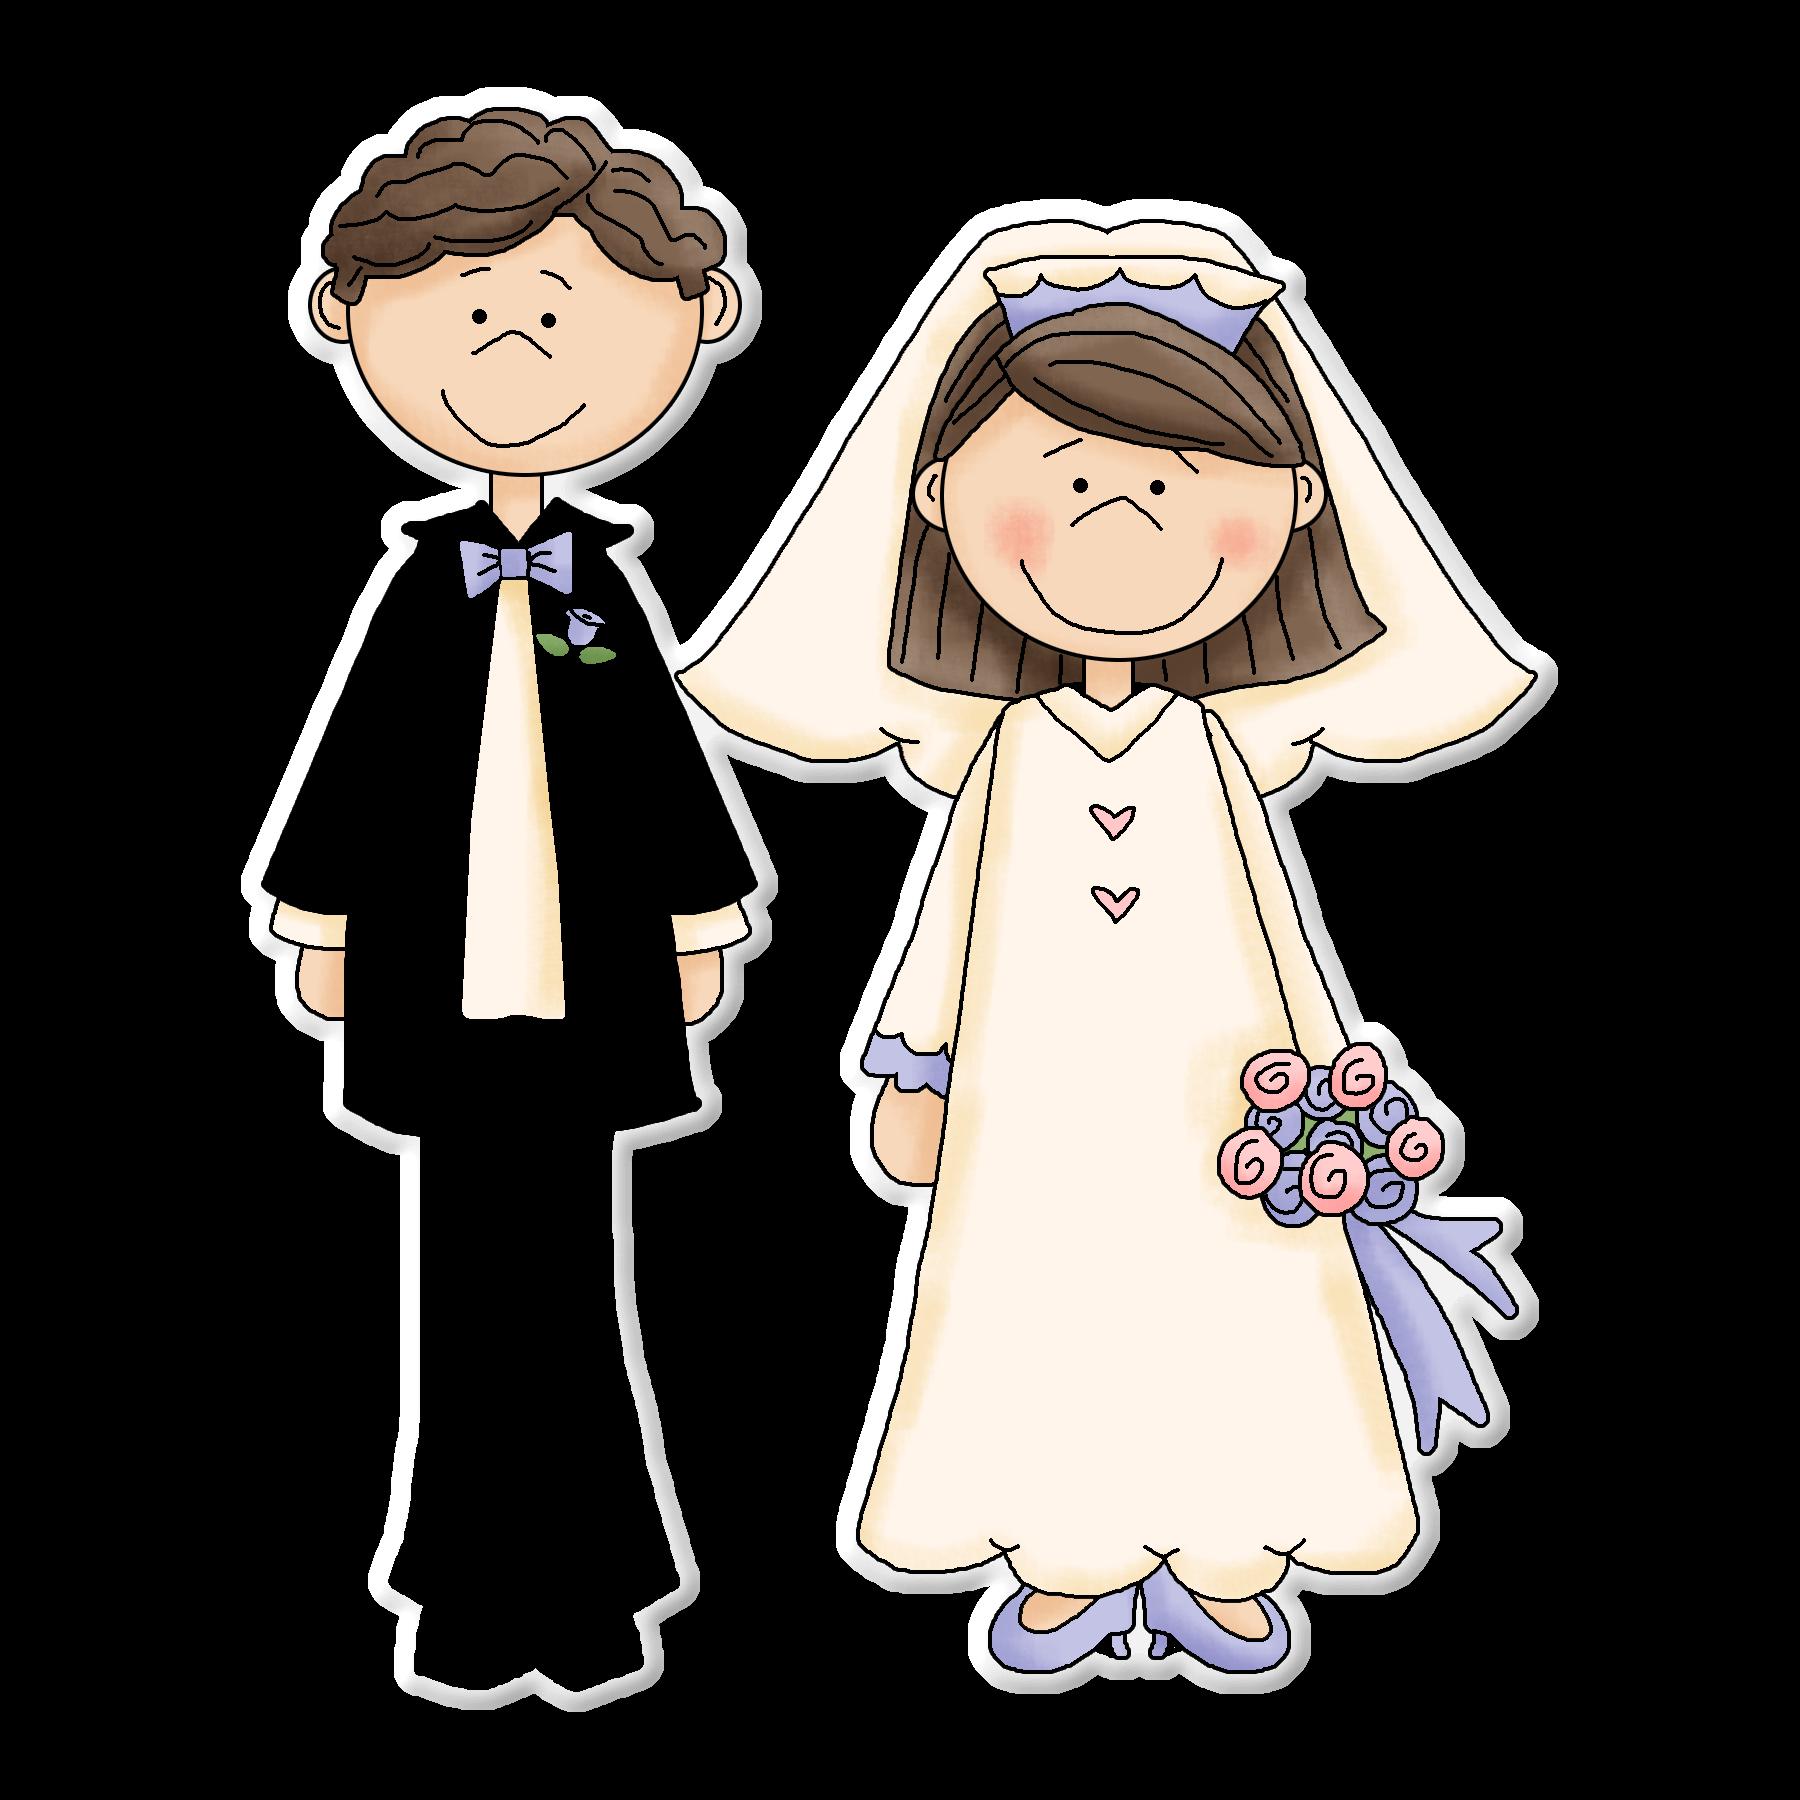 Wedding day clipart clip black and white stock Photo by @selmabuenoaltran - Minus #clipart #wedding | ღ ... clip black and white stock